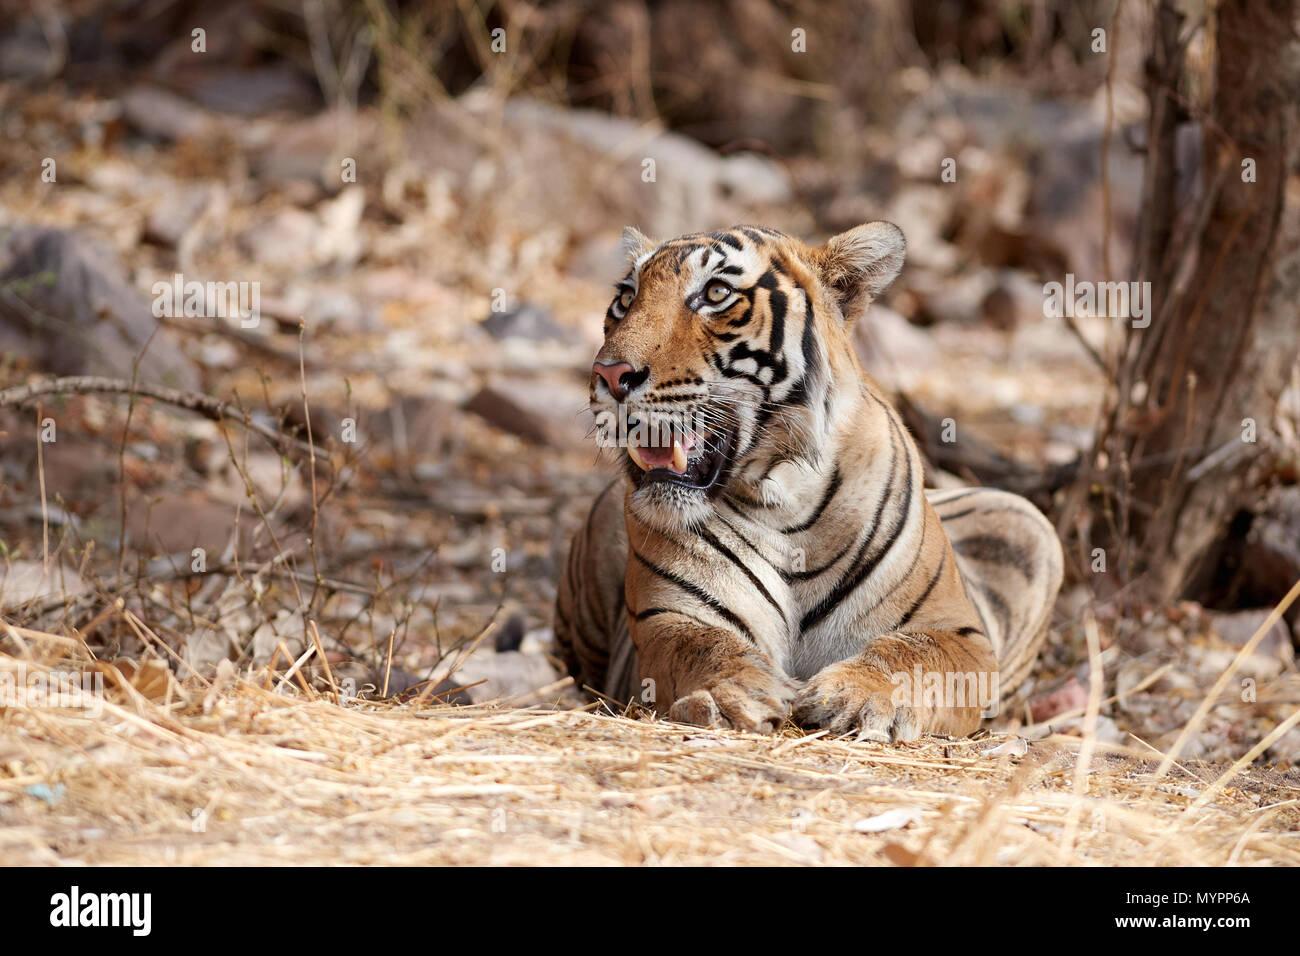 Tiger cub Stockbild